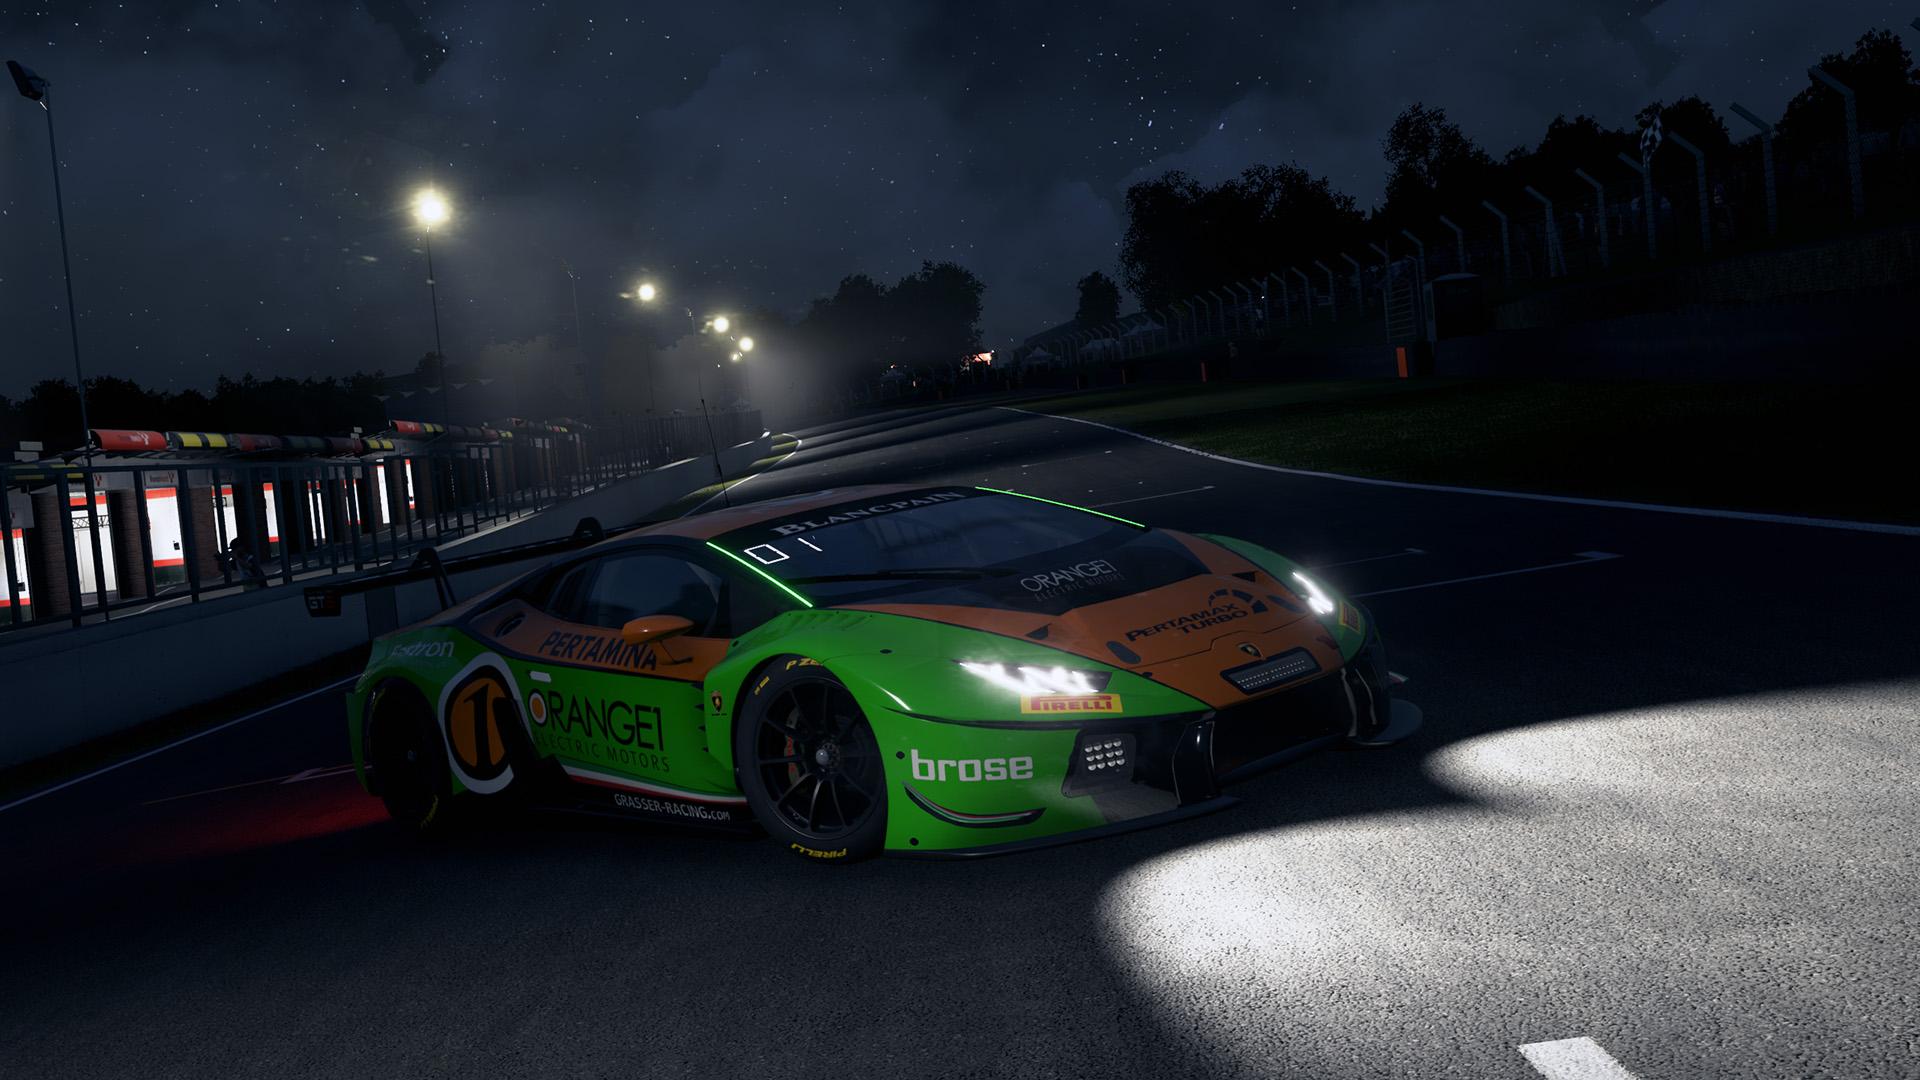 acc-racedepartment-com-1-jpg.239776